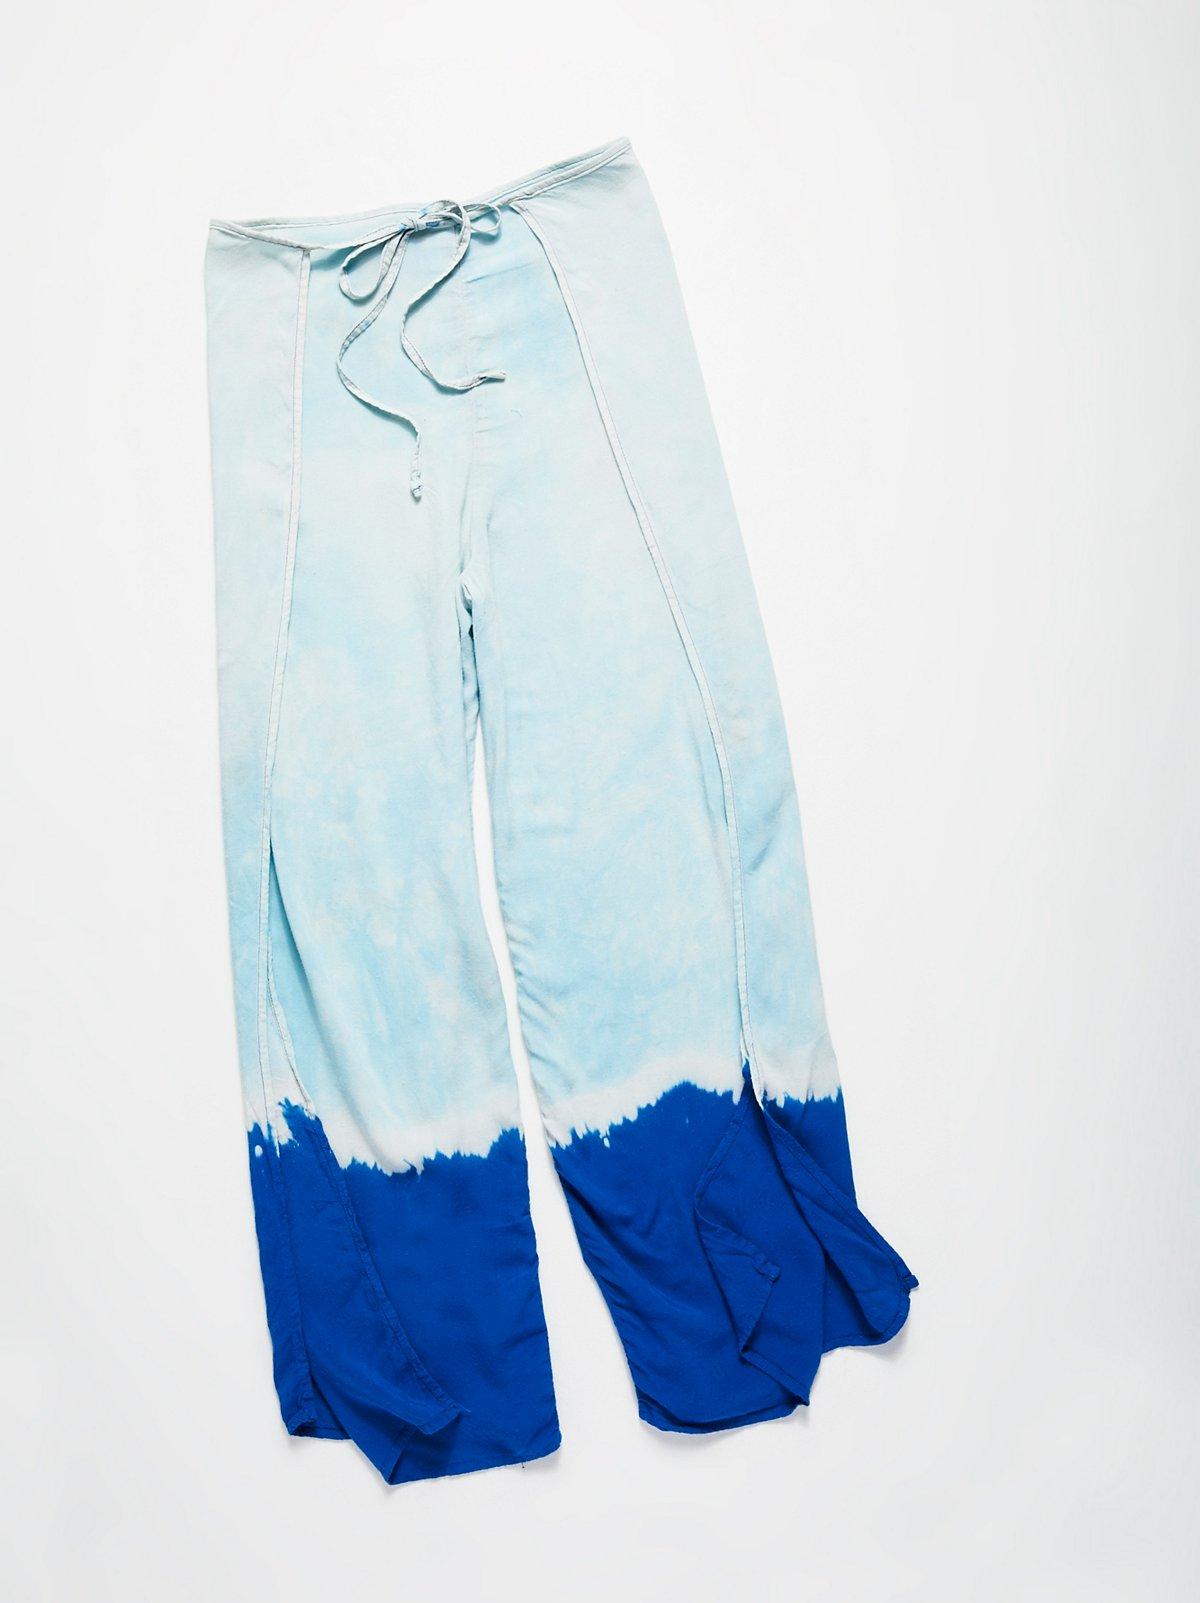 Vintage 1980s Wrap Pants